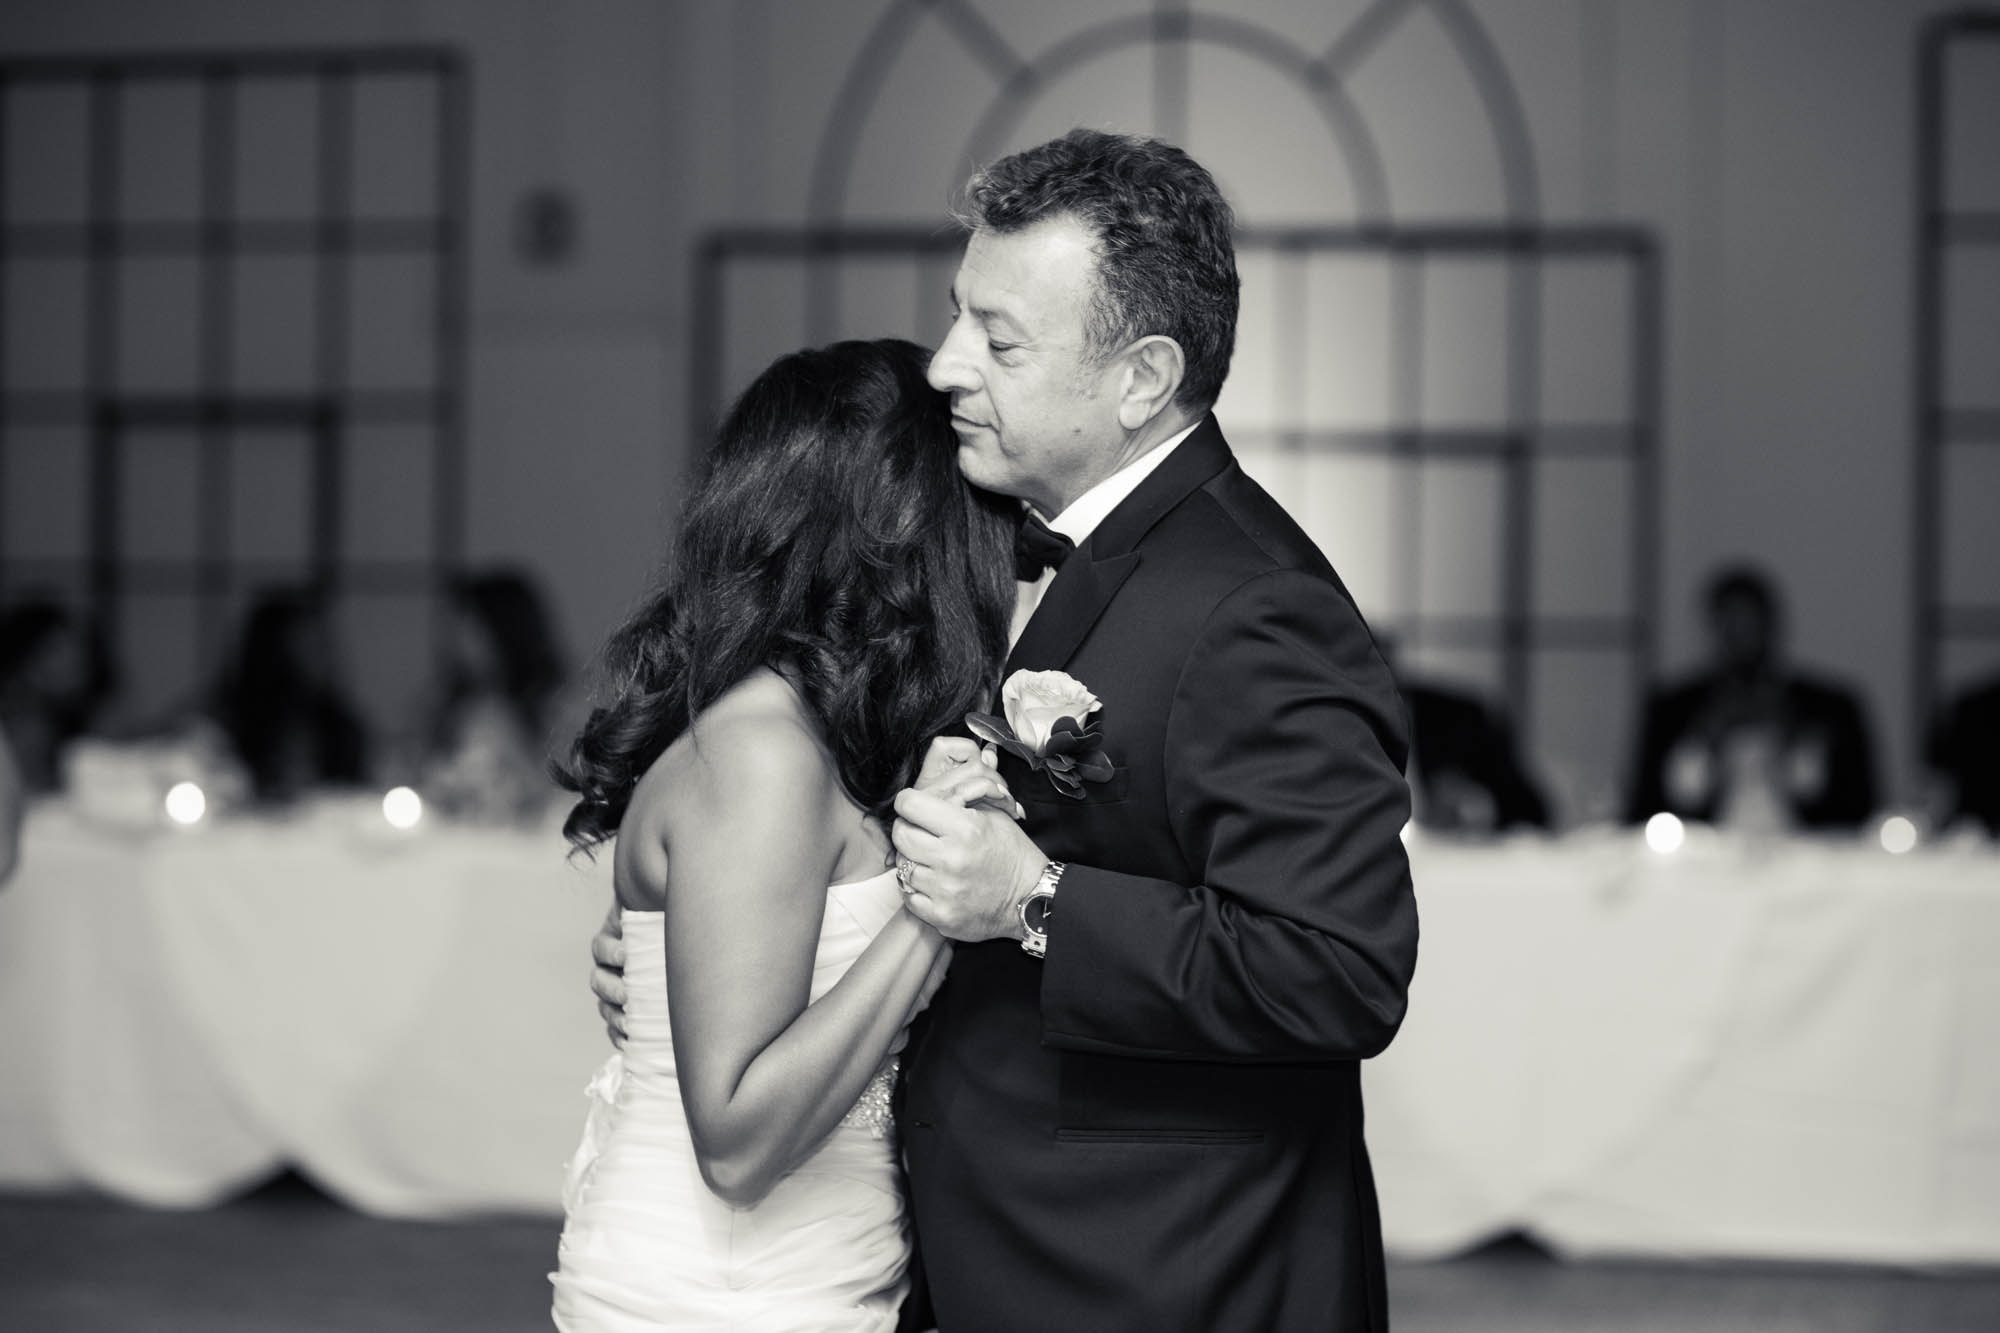 mellwood louisville wedding kendra lynne photography-25.jpg